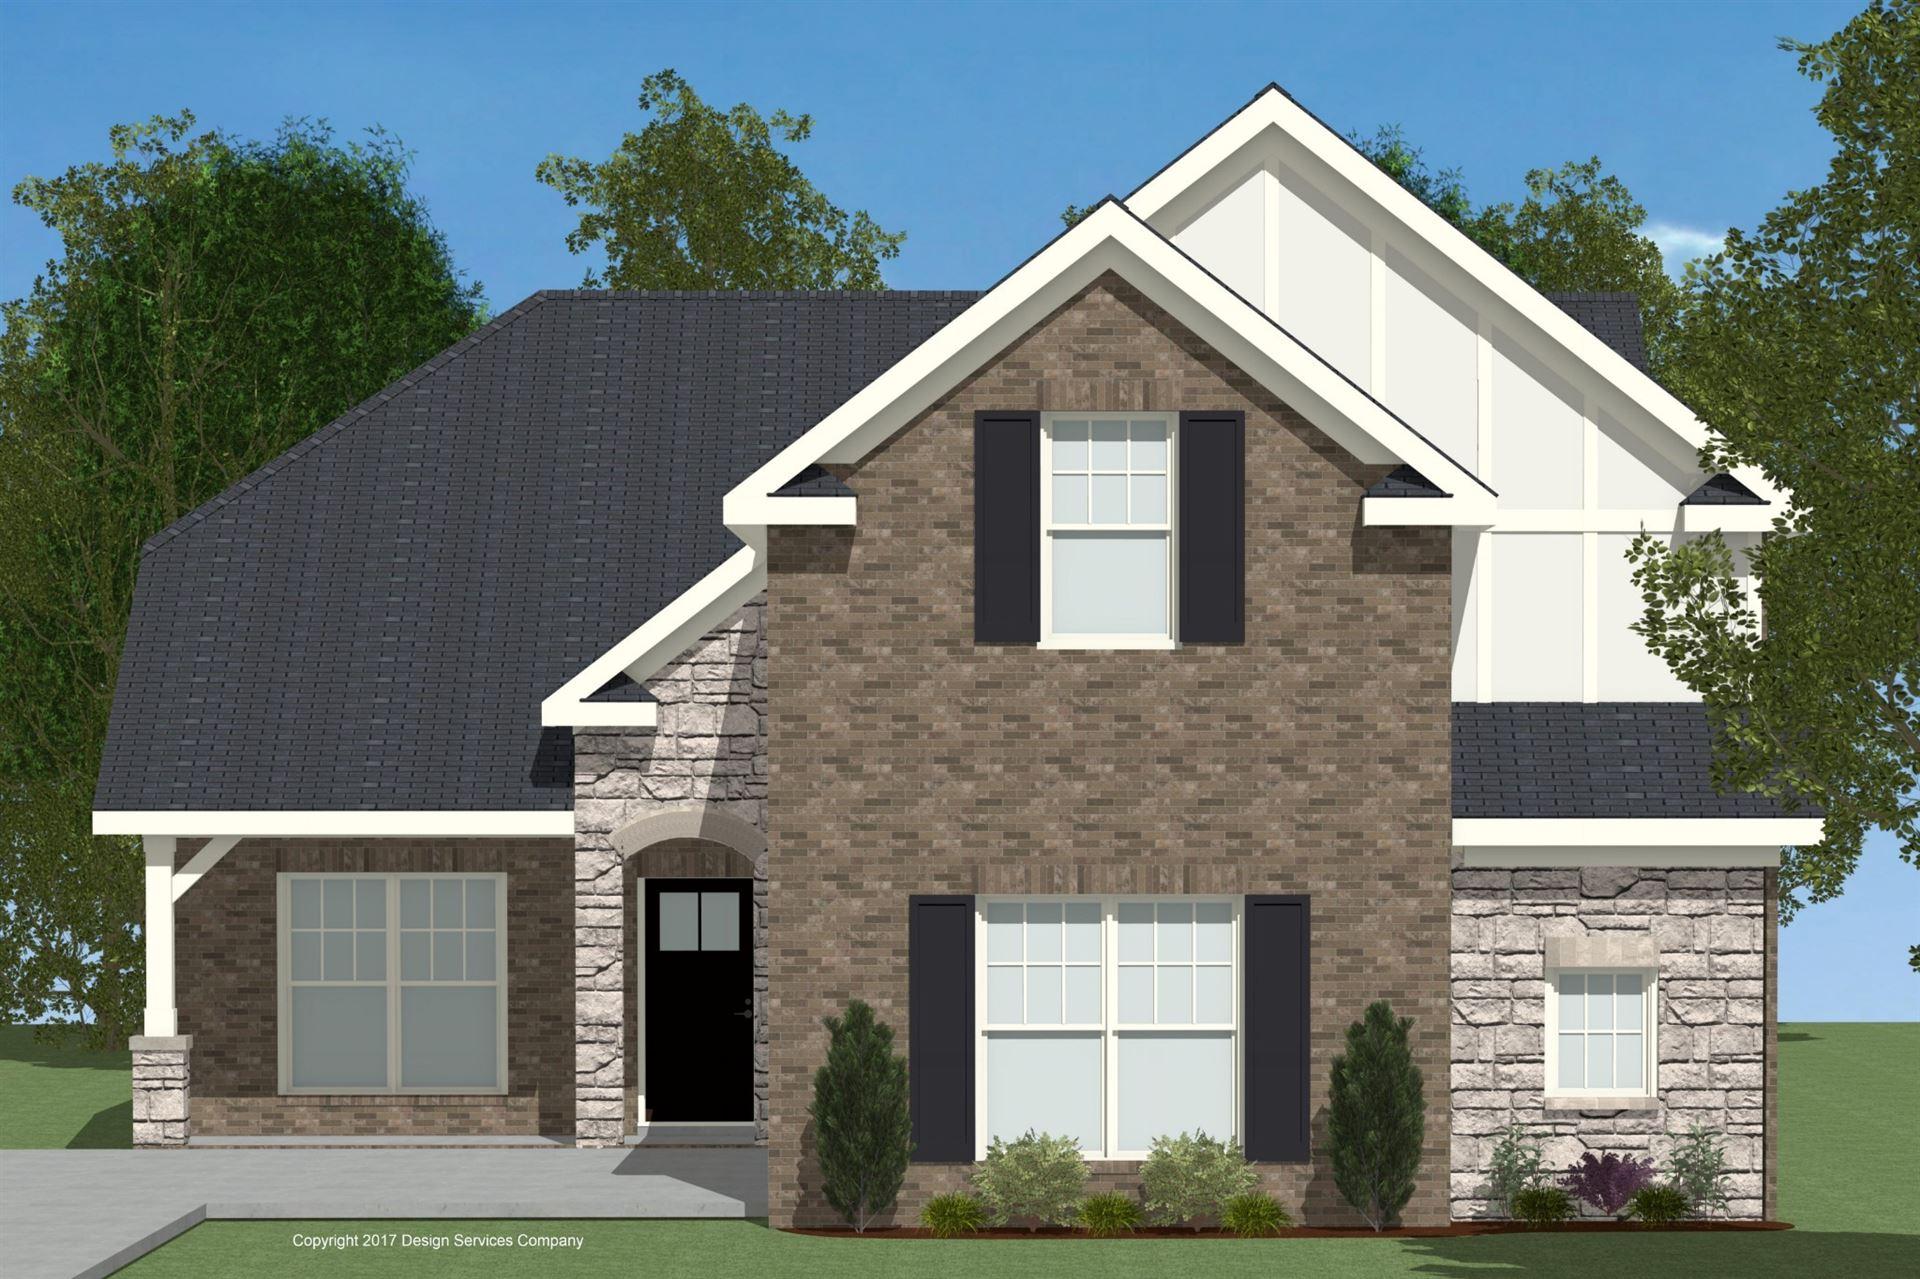 Photo of 6593 Frye Lane, Hermitage, TN 37076 (MLS # 2255704)